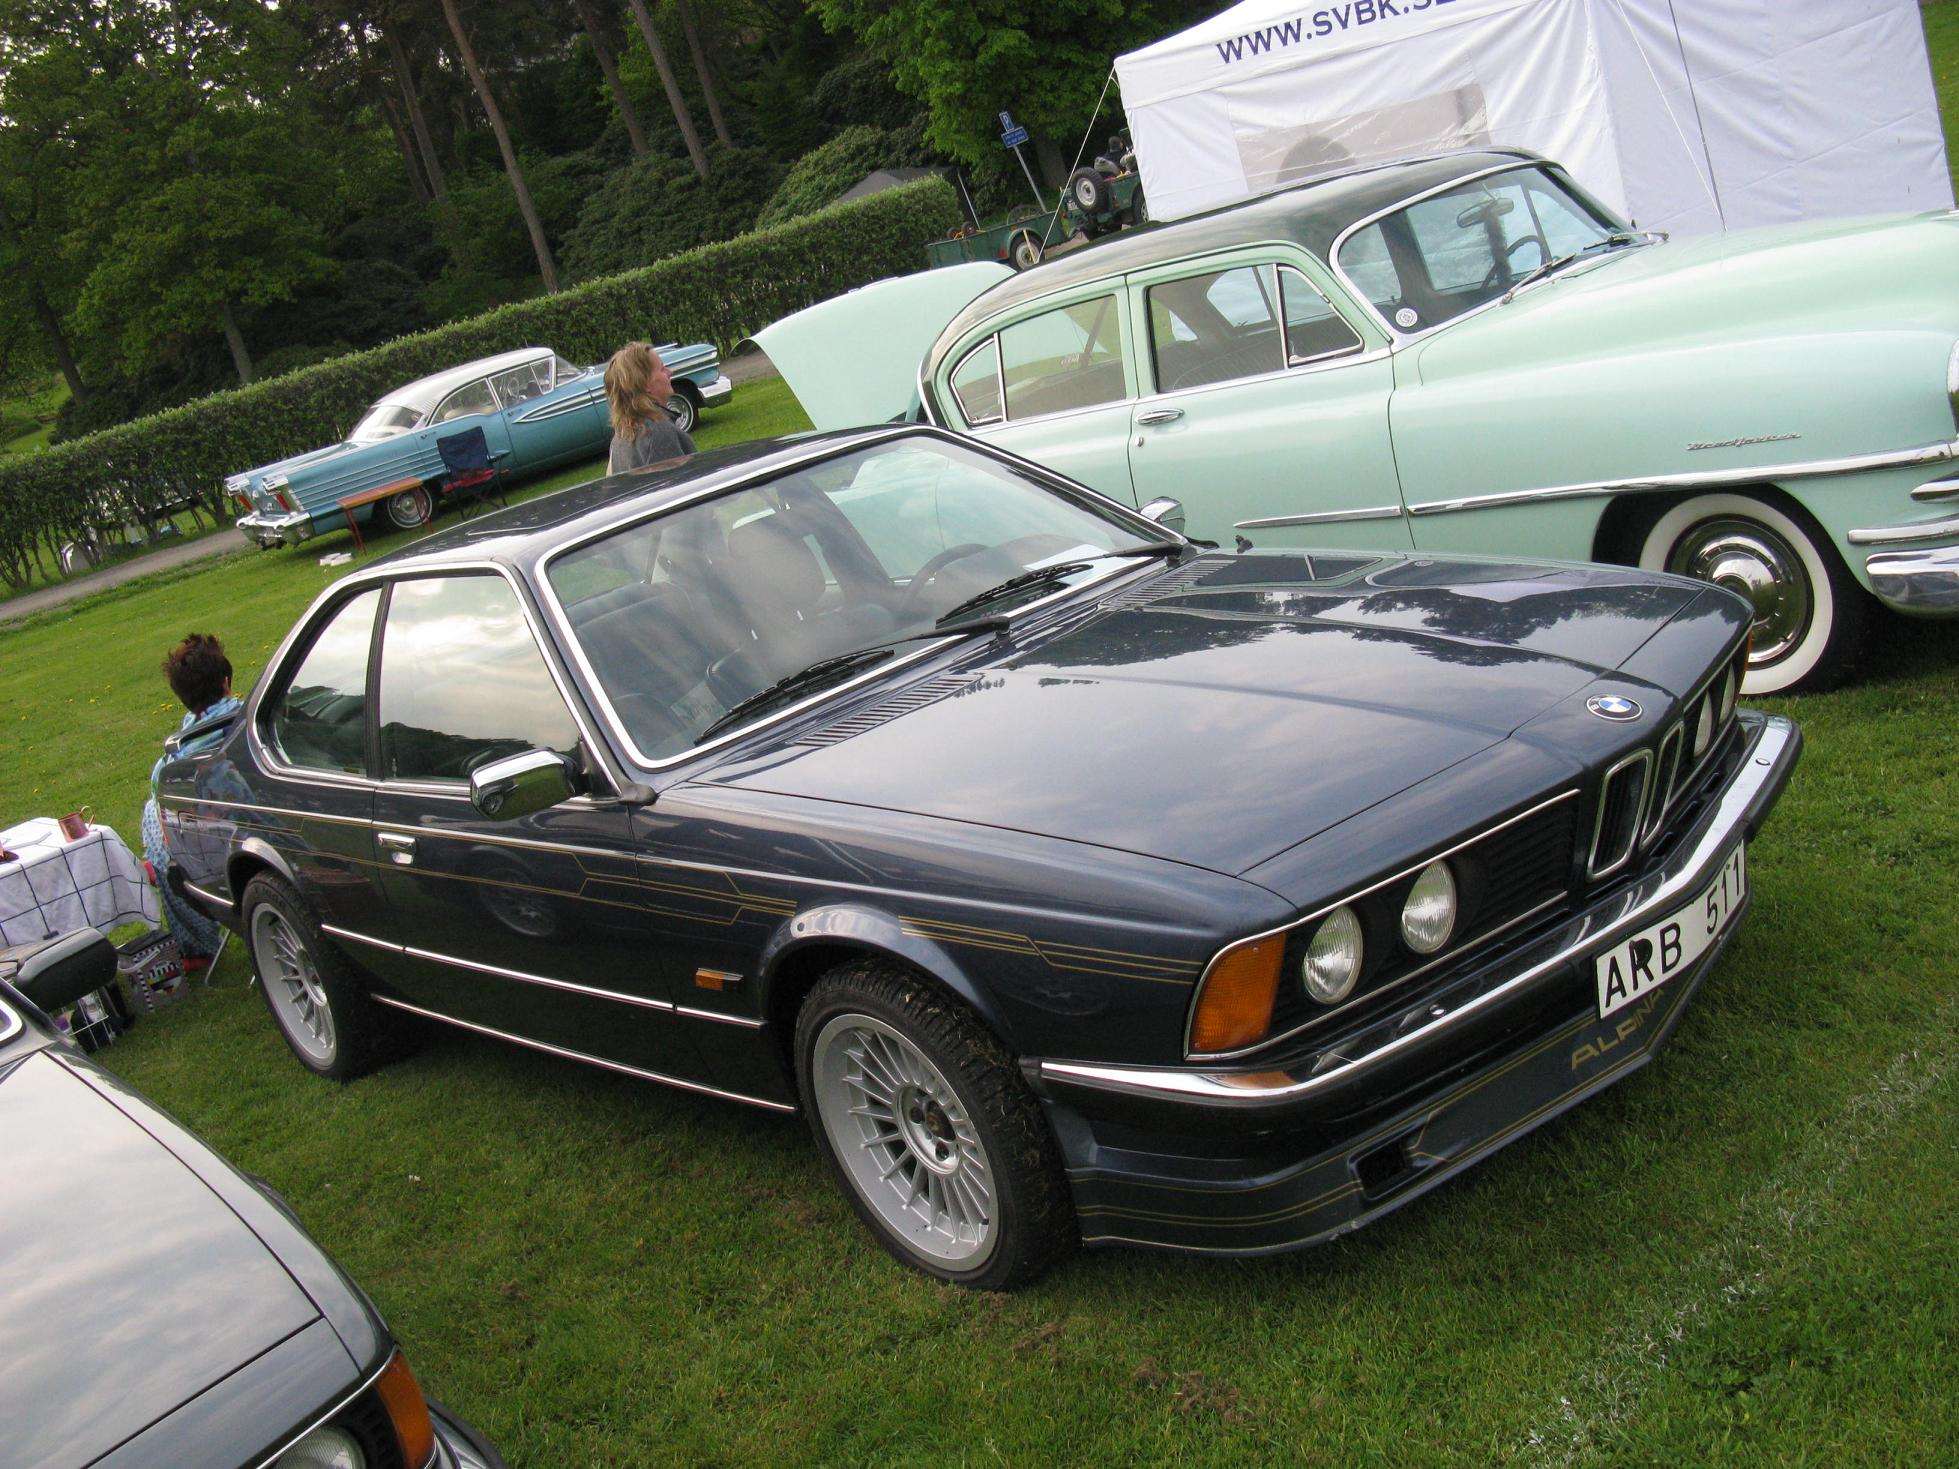 File:BMW 630 CS Alpina Replica (5748570578).jpg - Wikimedia Commons